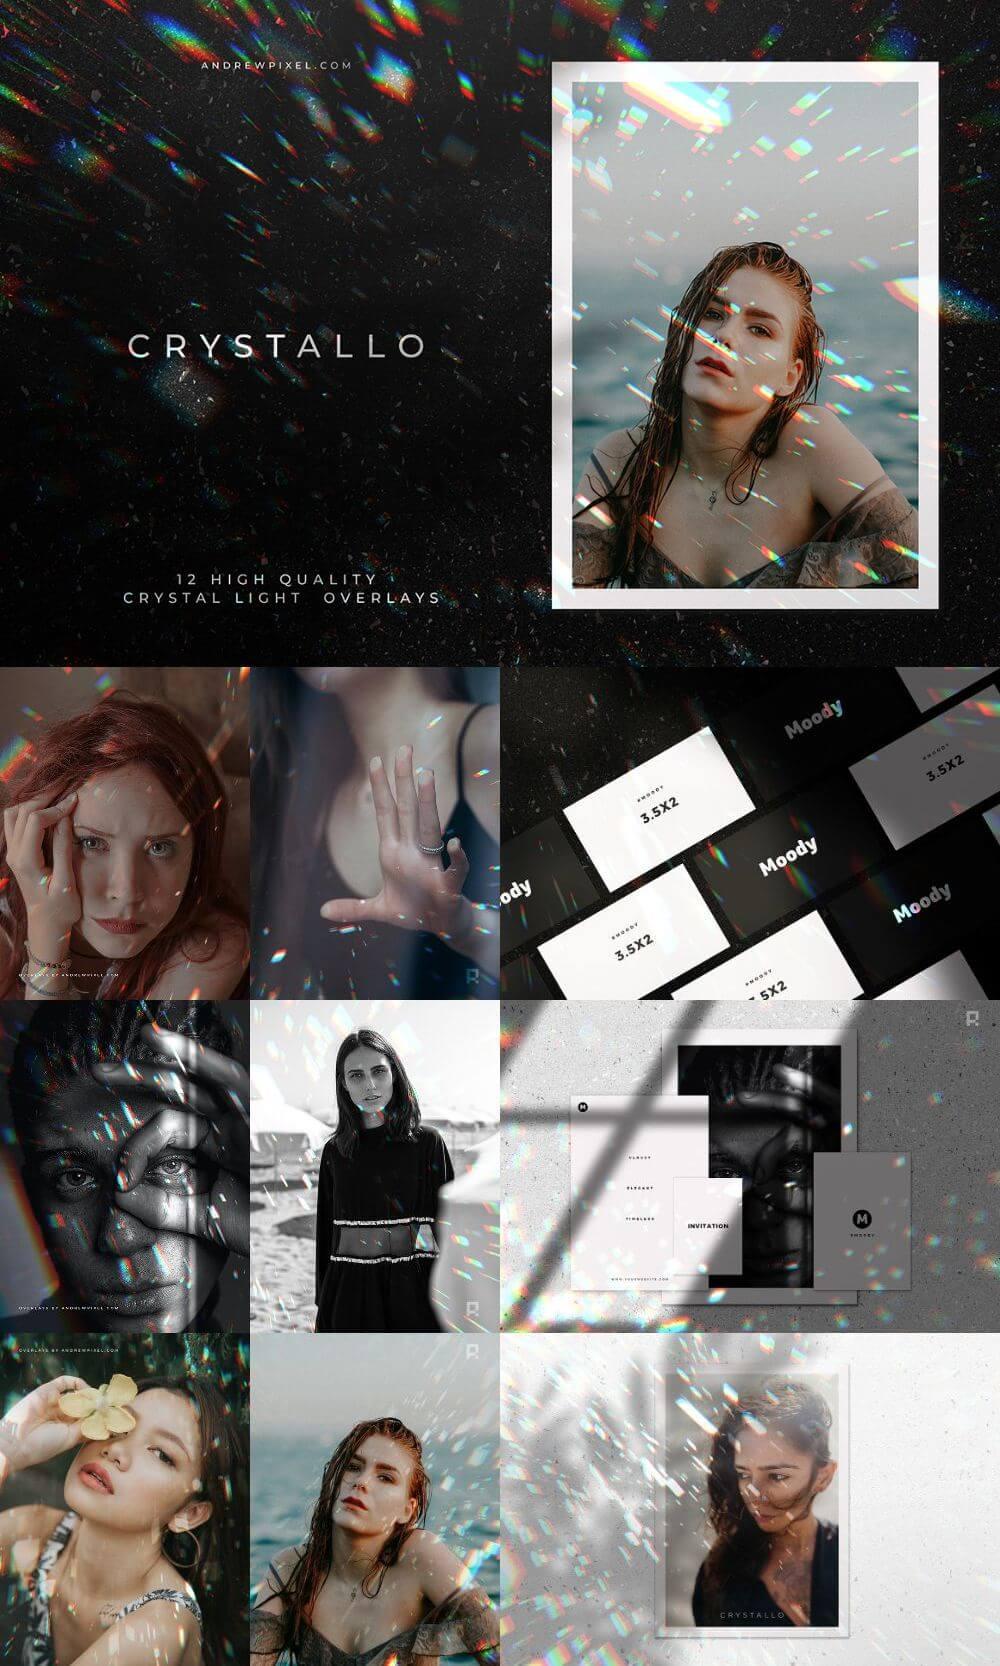 Crystallo – Crystal Light Overlays